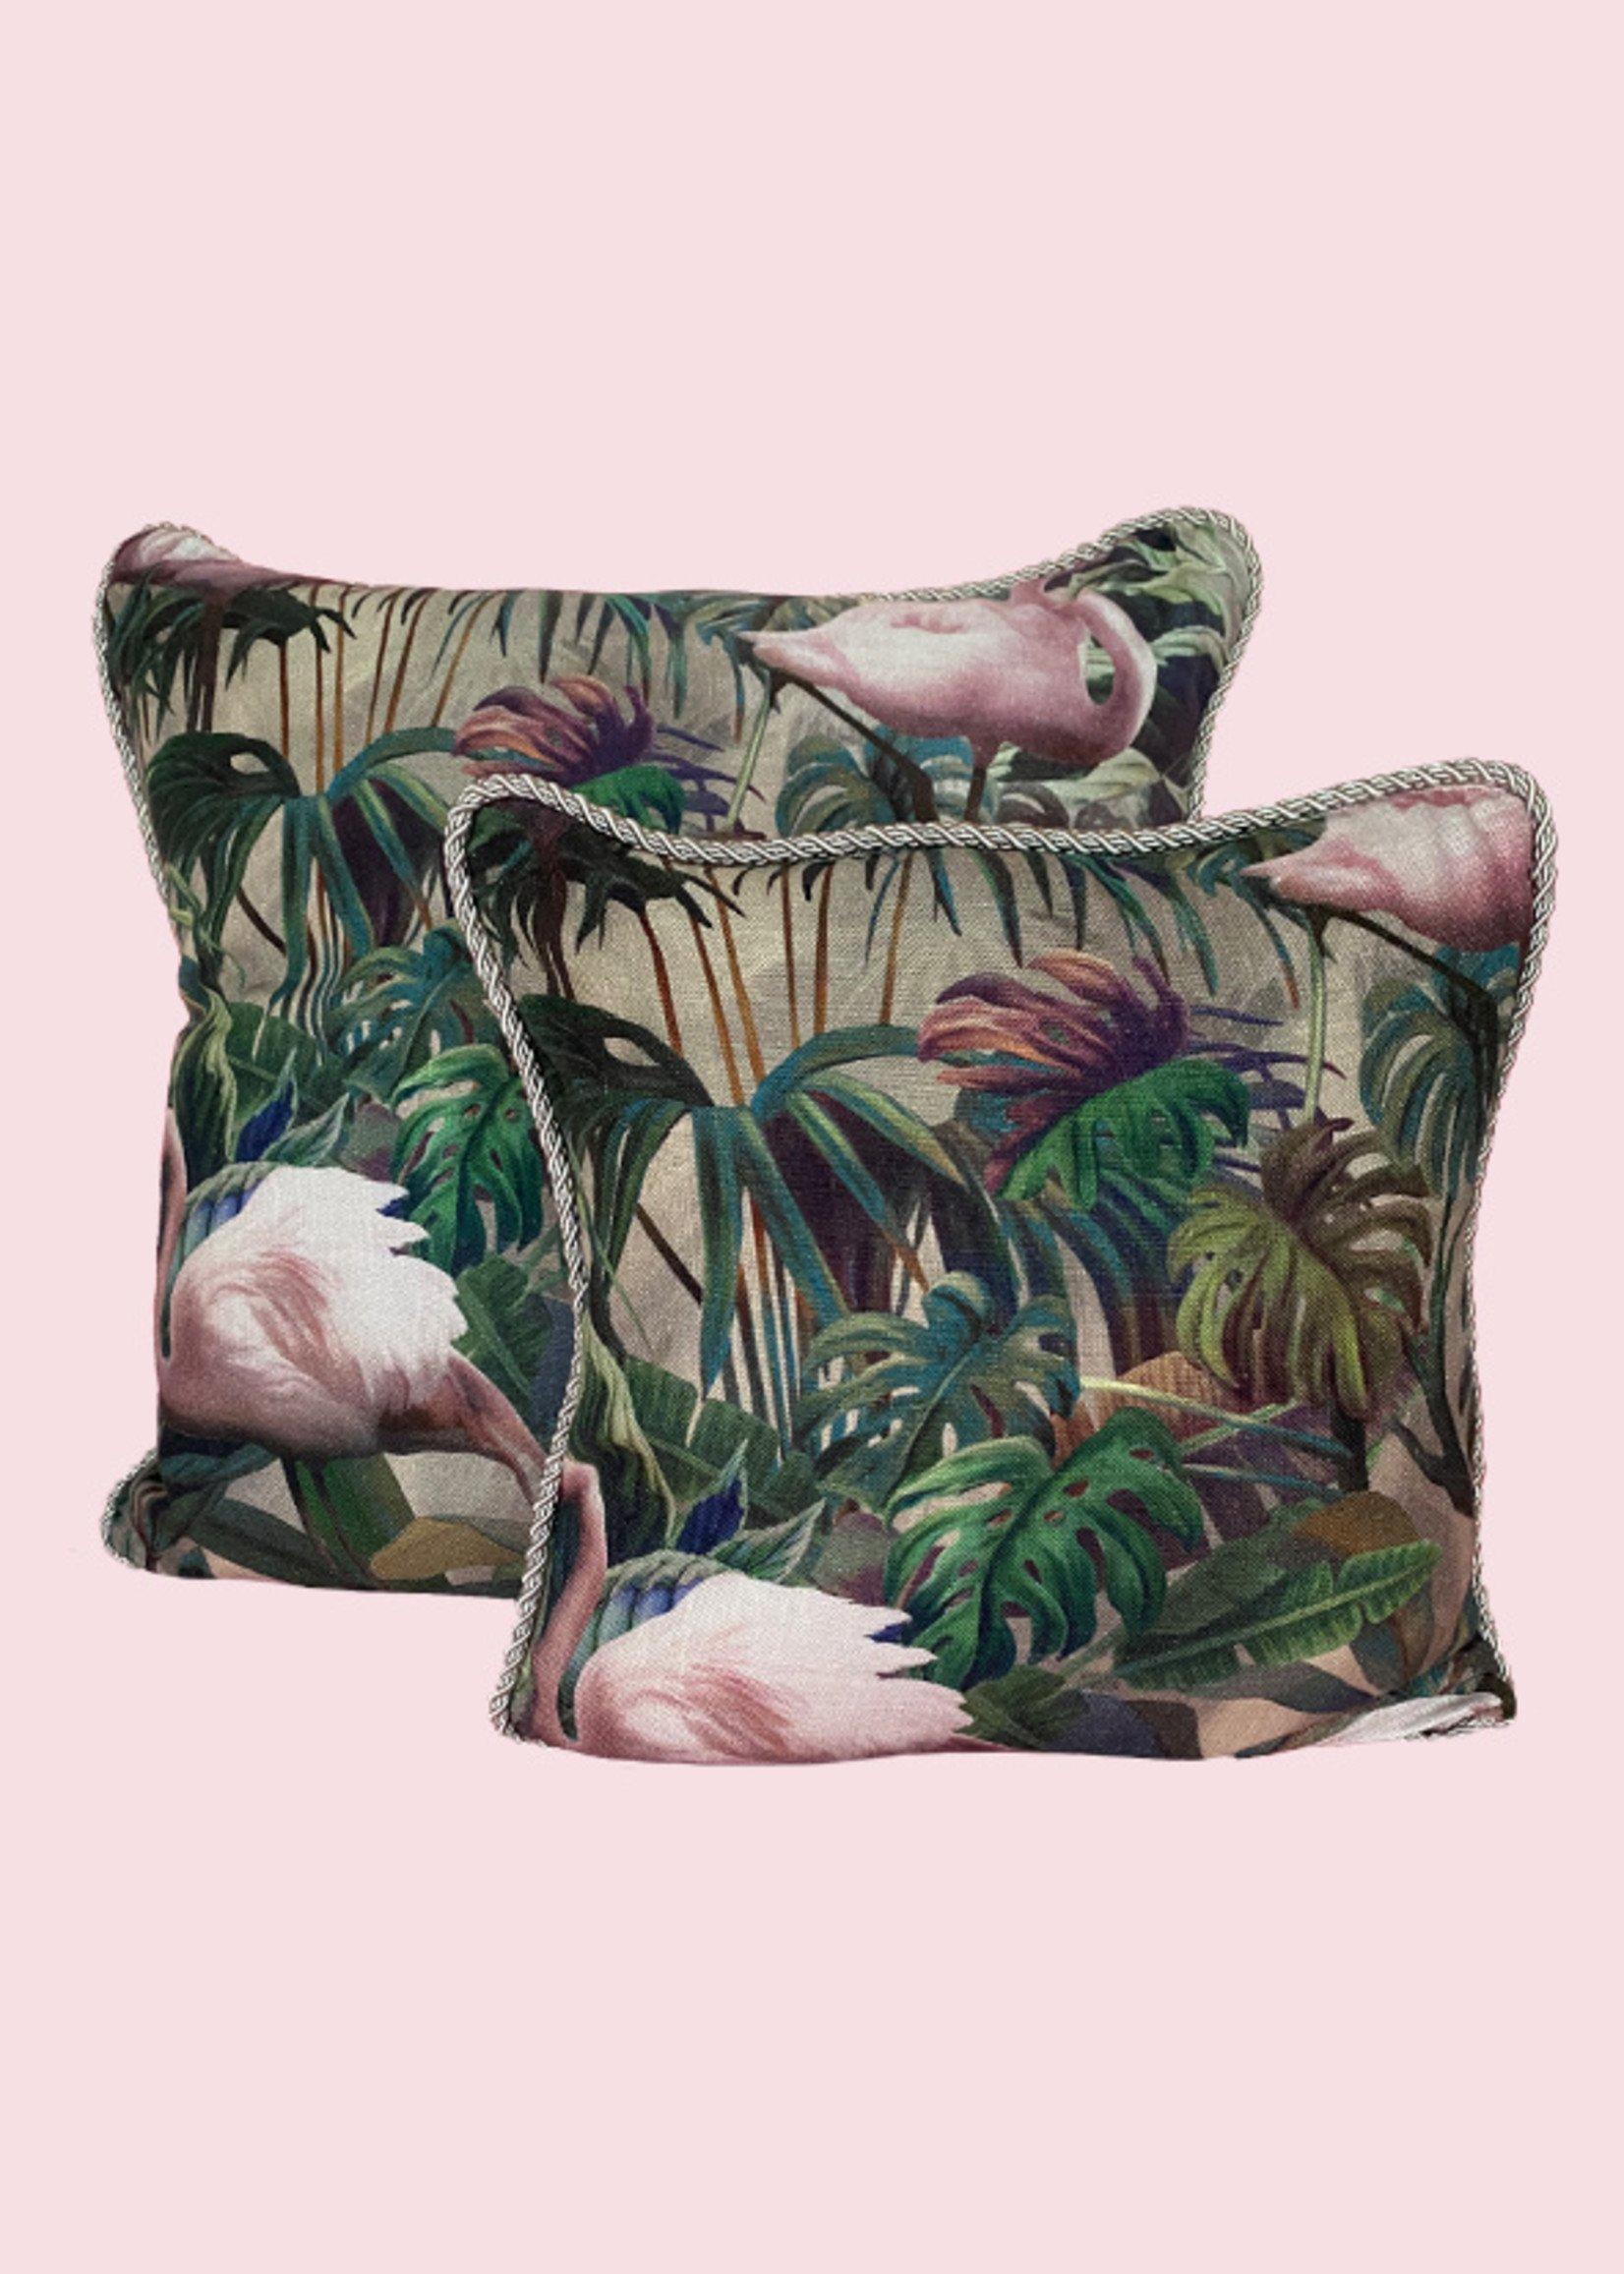 Esther's Flamingo Room's pillows, set of two sizes